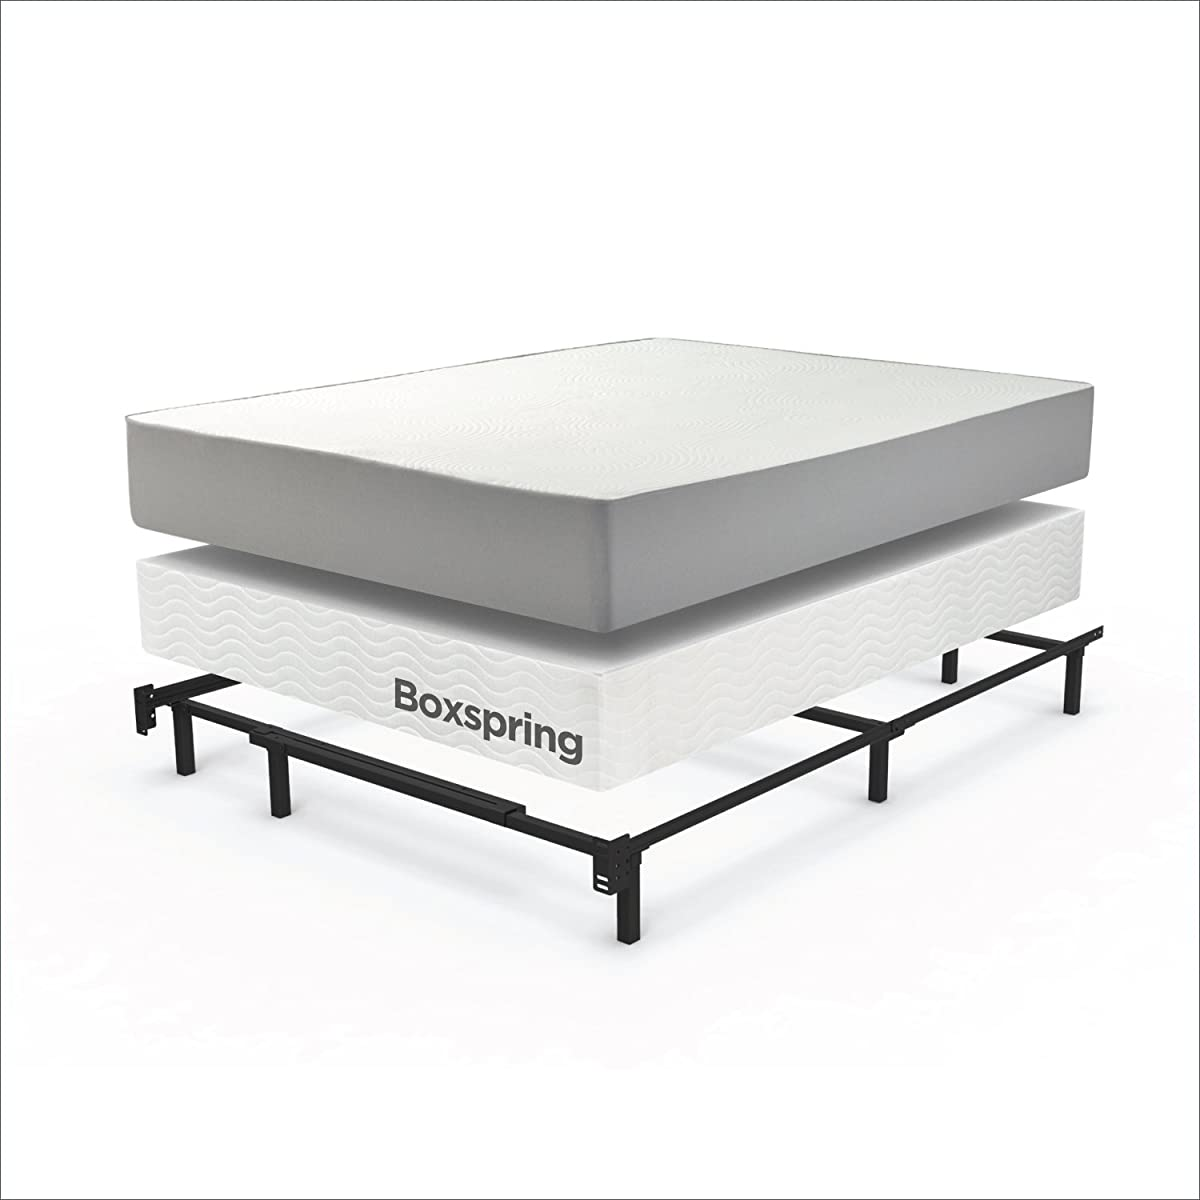 Zinus Compack 9-Leg Support Bed Frame, for Box Spring & Mattress Set, Queen